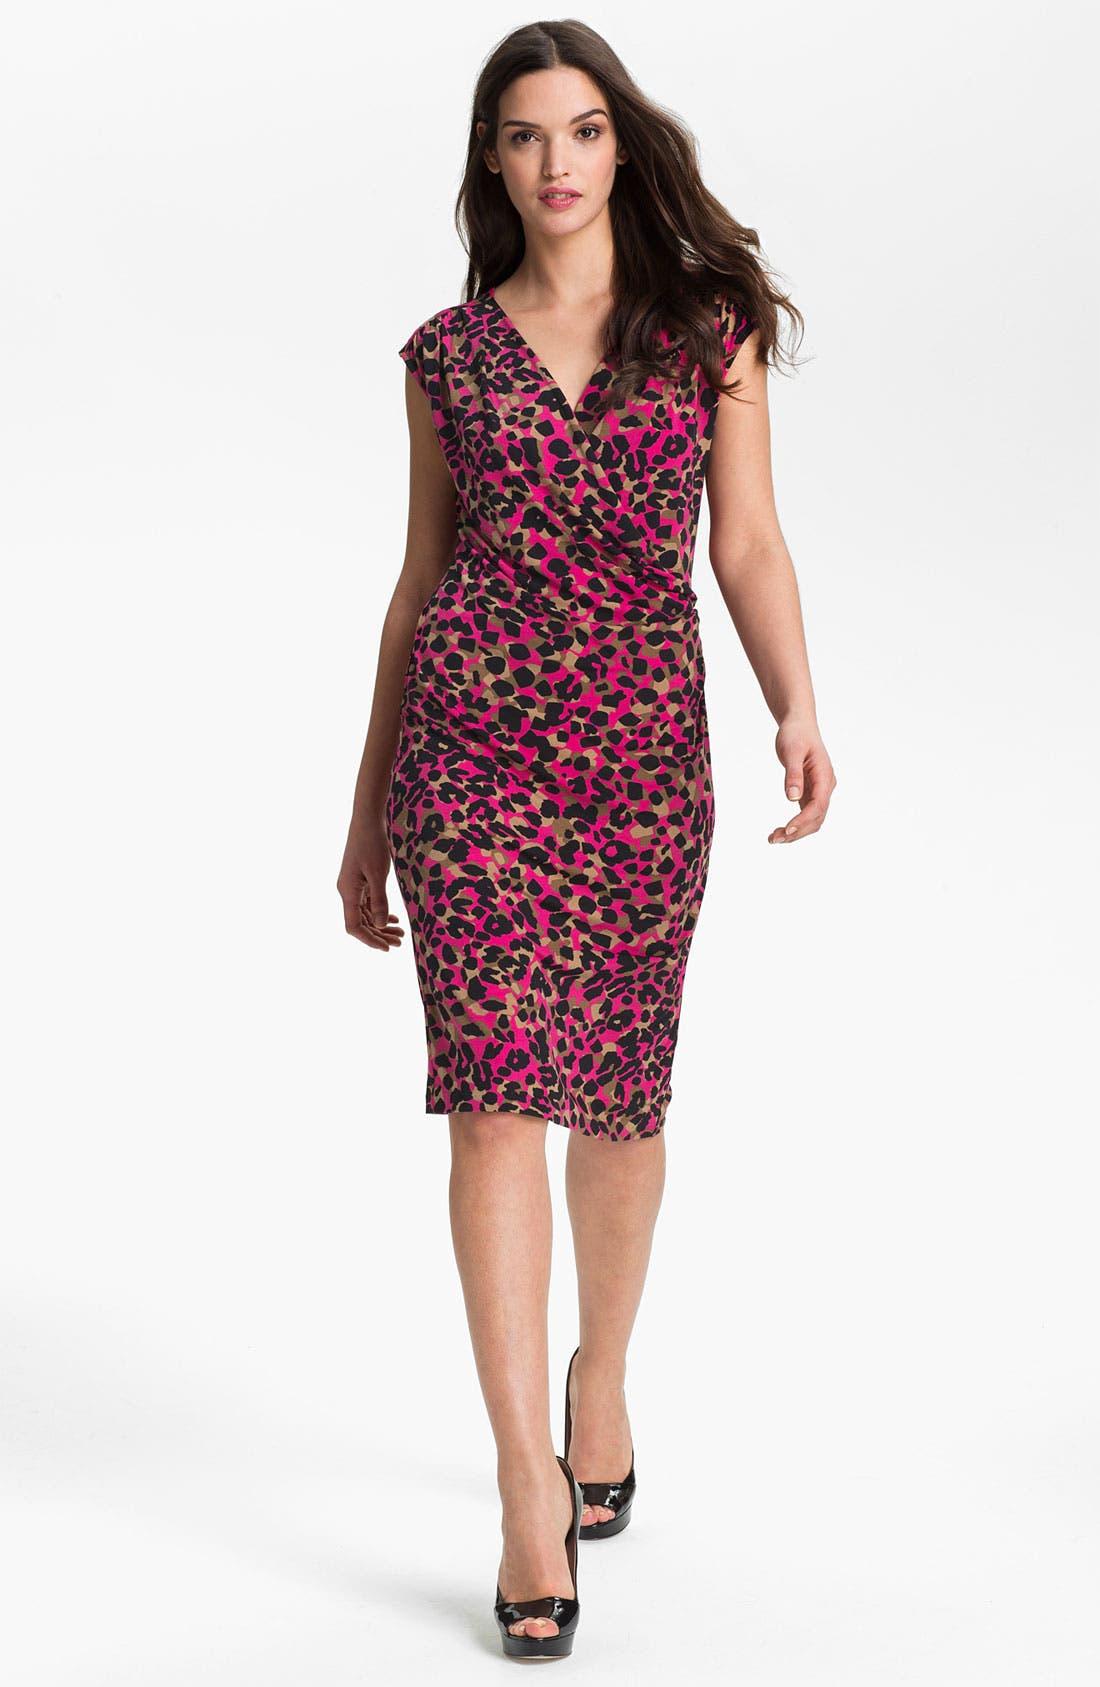 Alternate Image 1 Selected - Anne Klein Drape Front Animal Print Dress